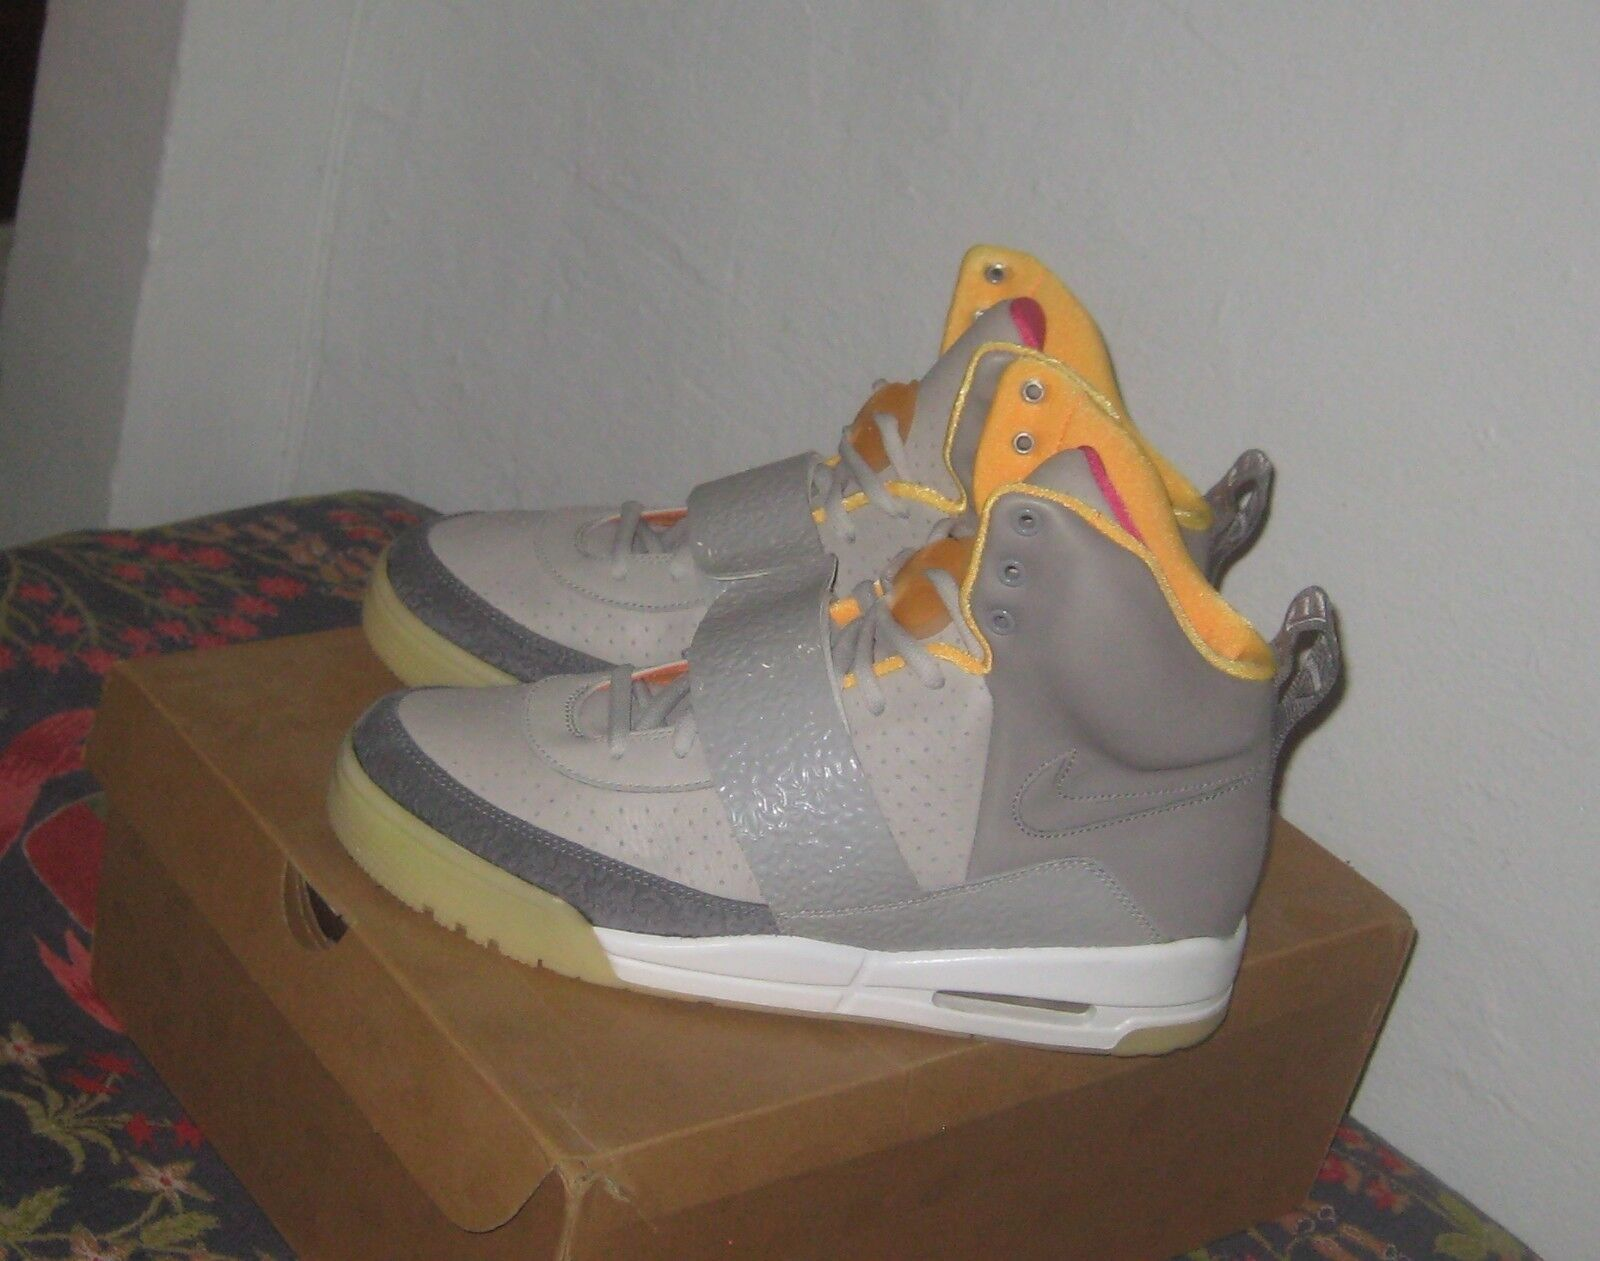 Nike air yeezy 1 batter zen luce grigia carbone batter 1 tan kanye west 2009 11 nuove dimensioni 0644d3